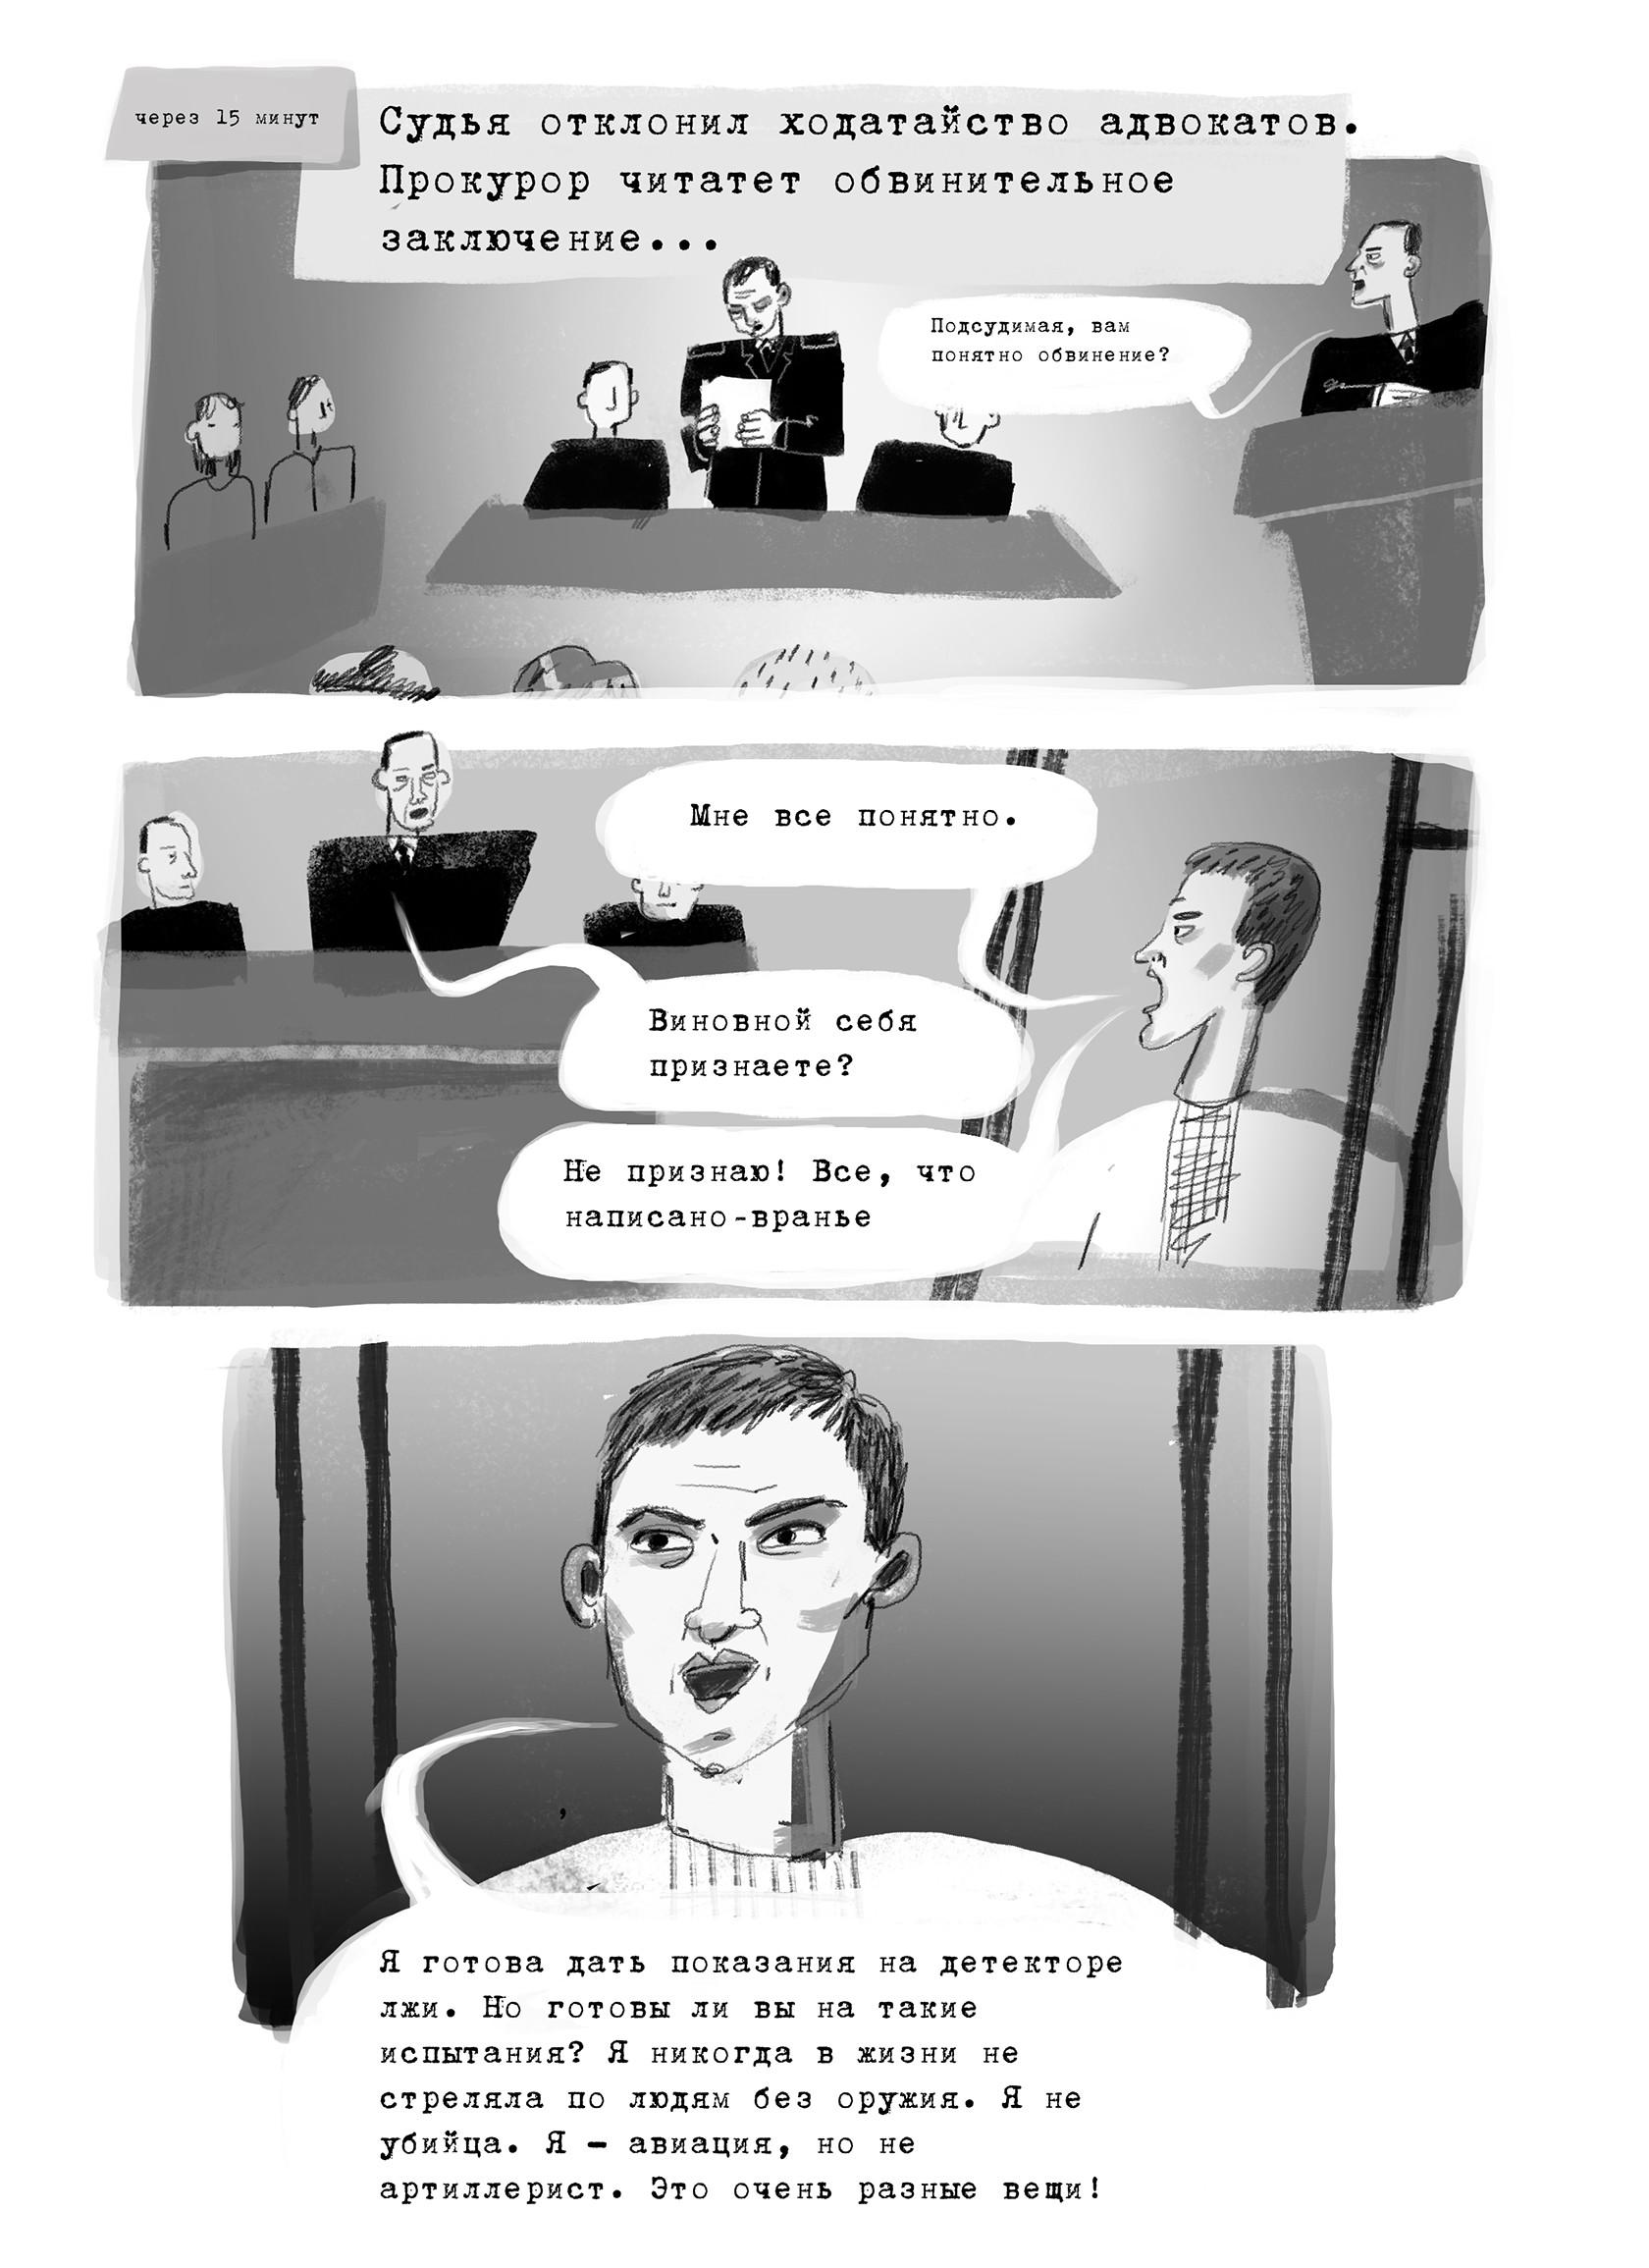 В Росії Савченко стала героїнею коміксу - фото 4